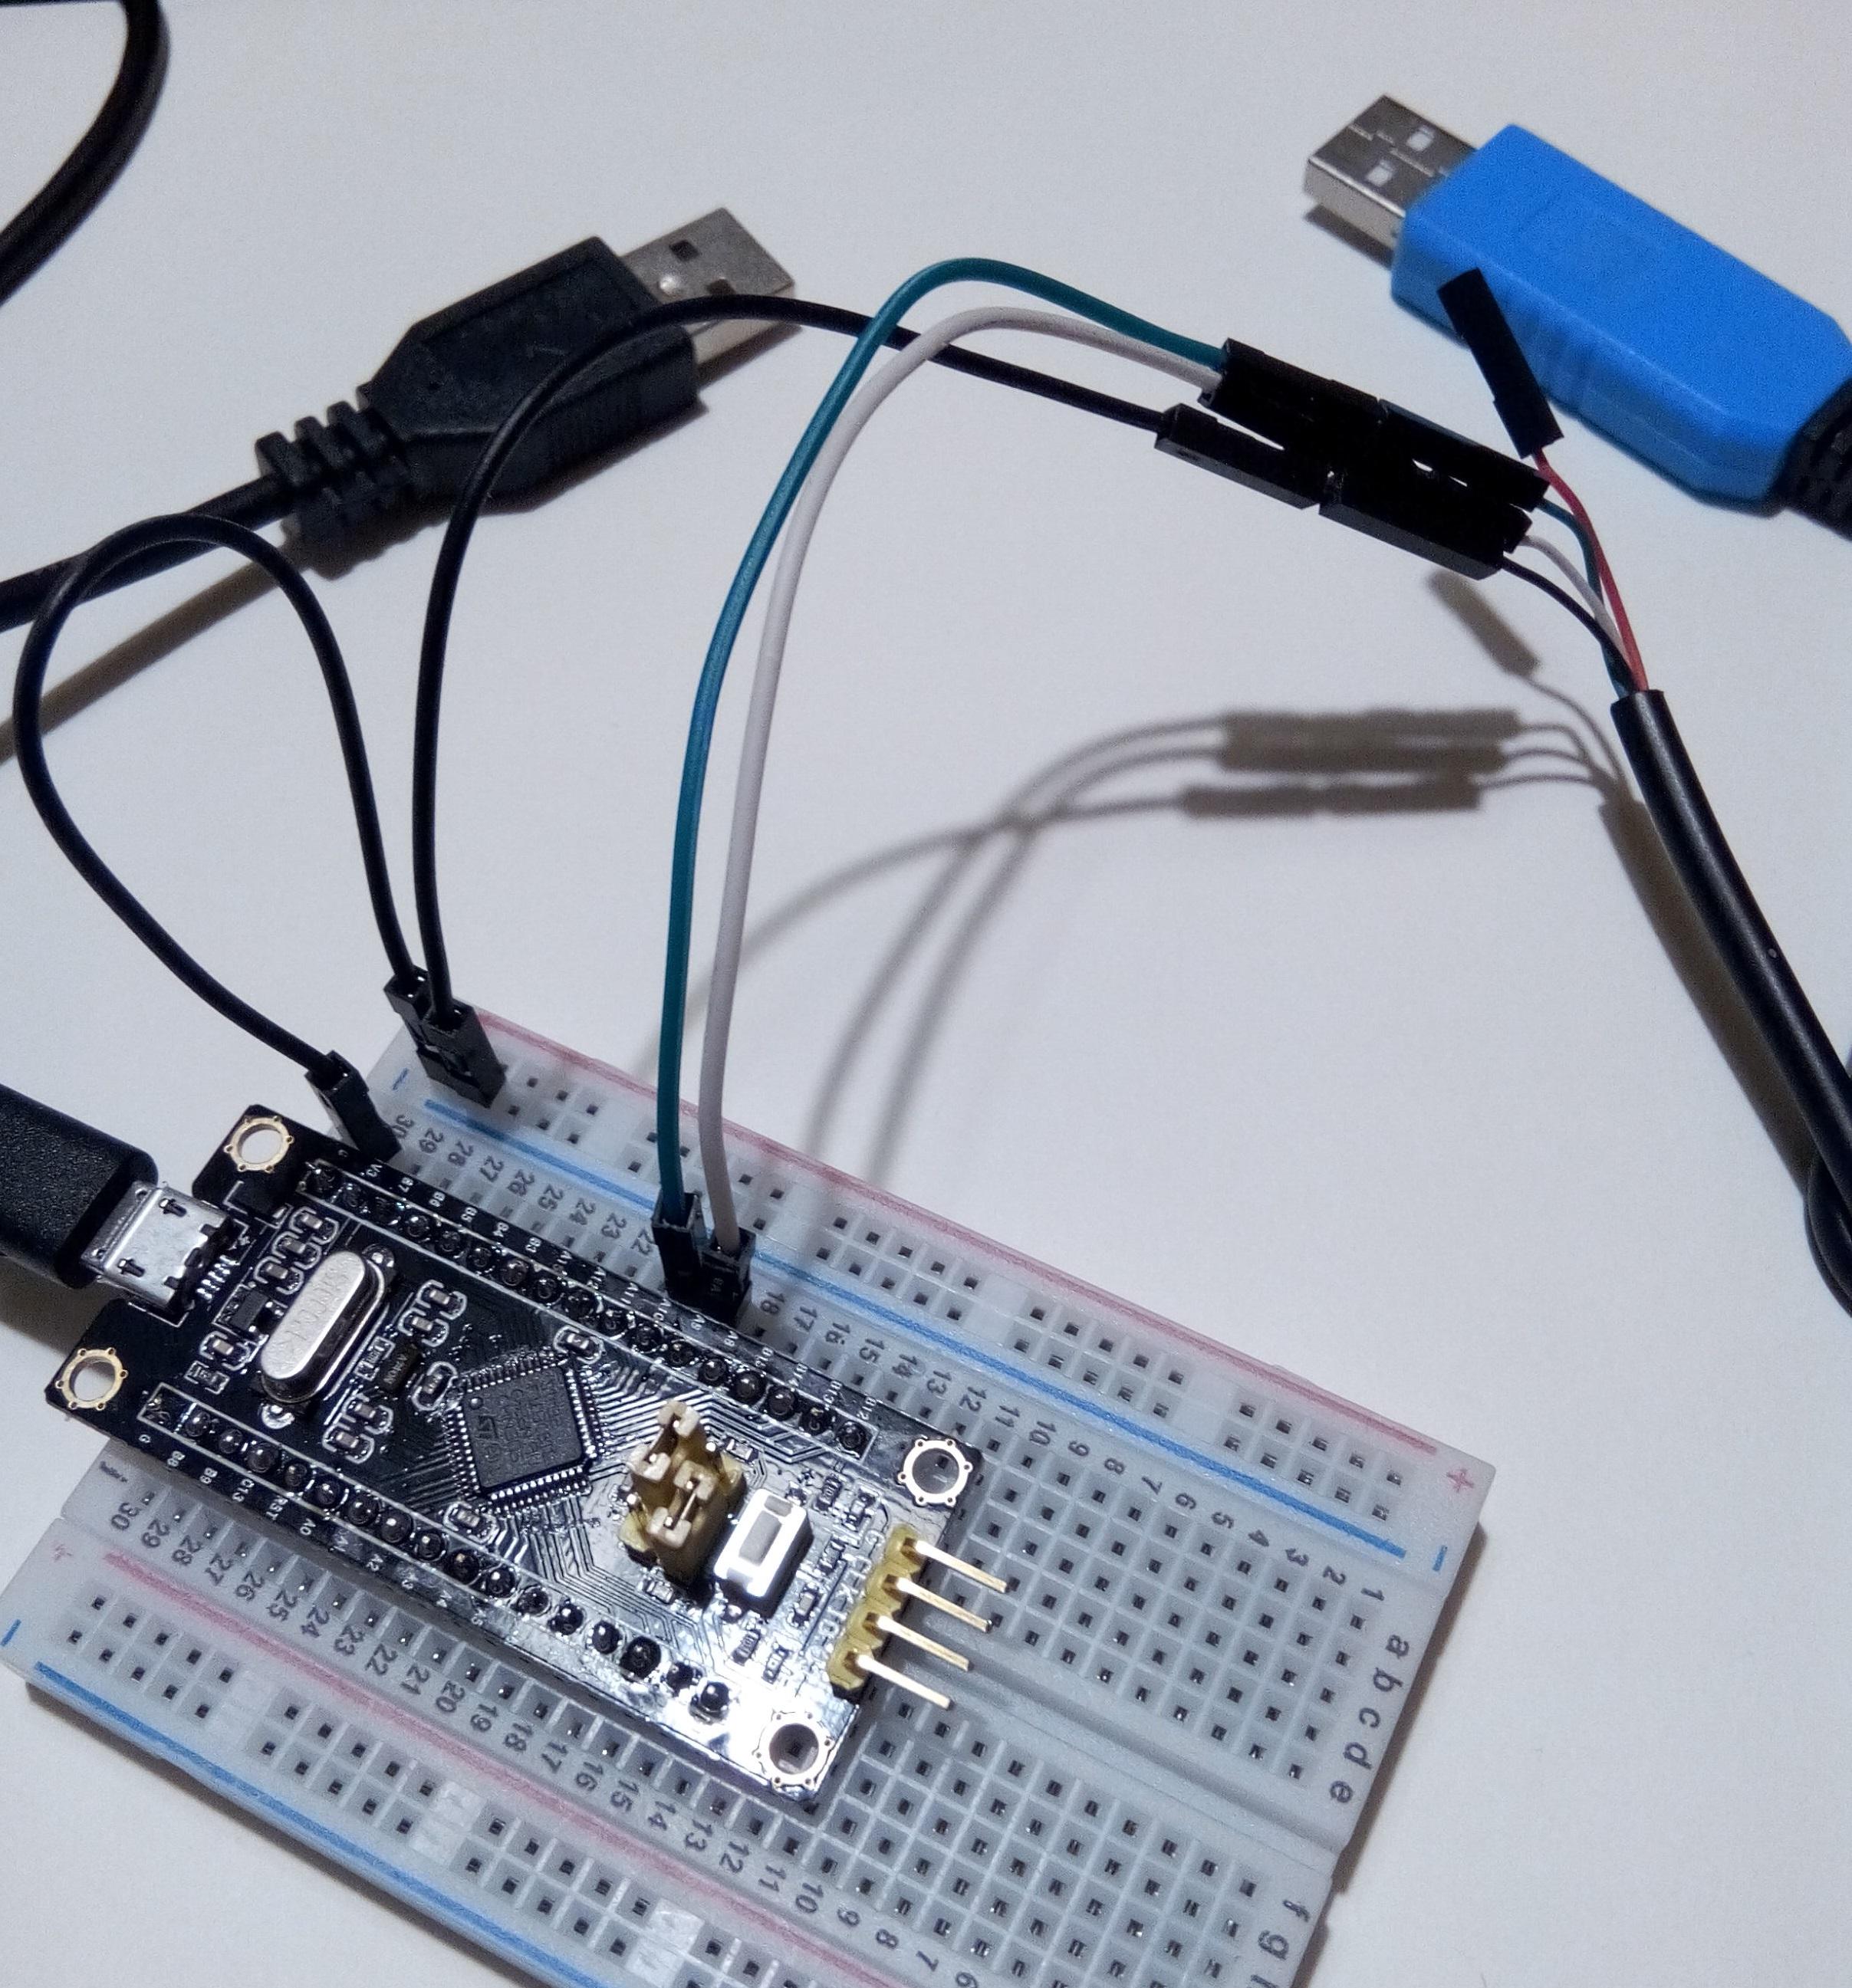 Schwarz: USB für 5V --> 3.3V am Chip. Blau: USB-ser für RX/TX.